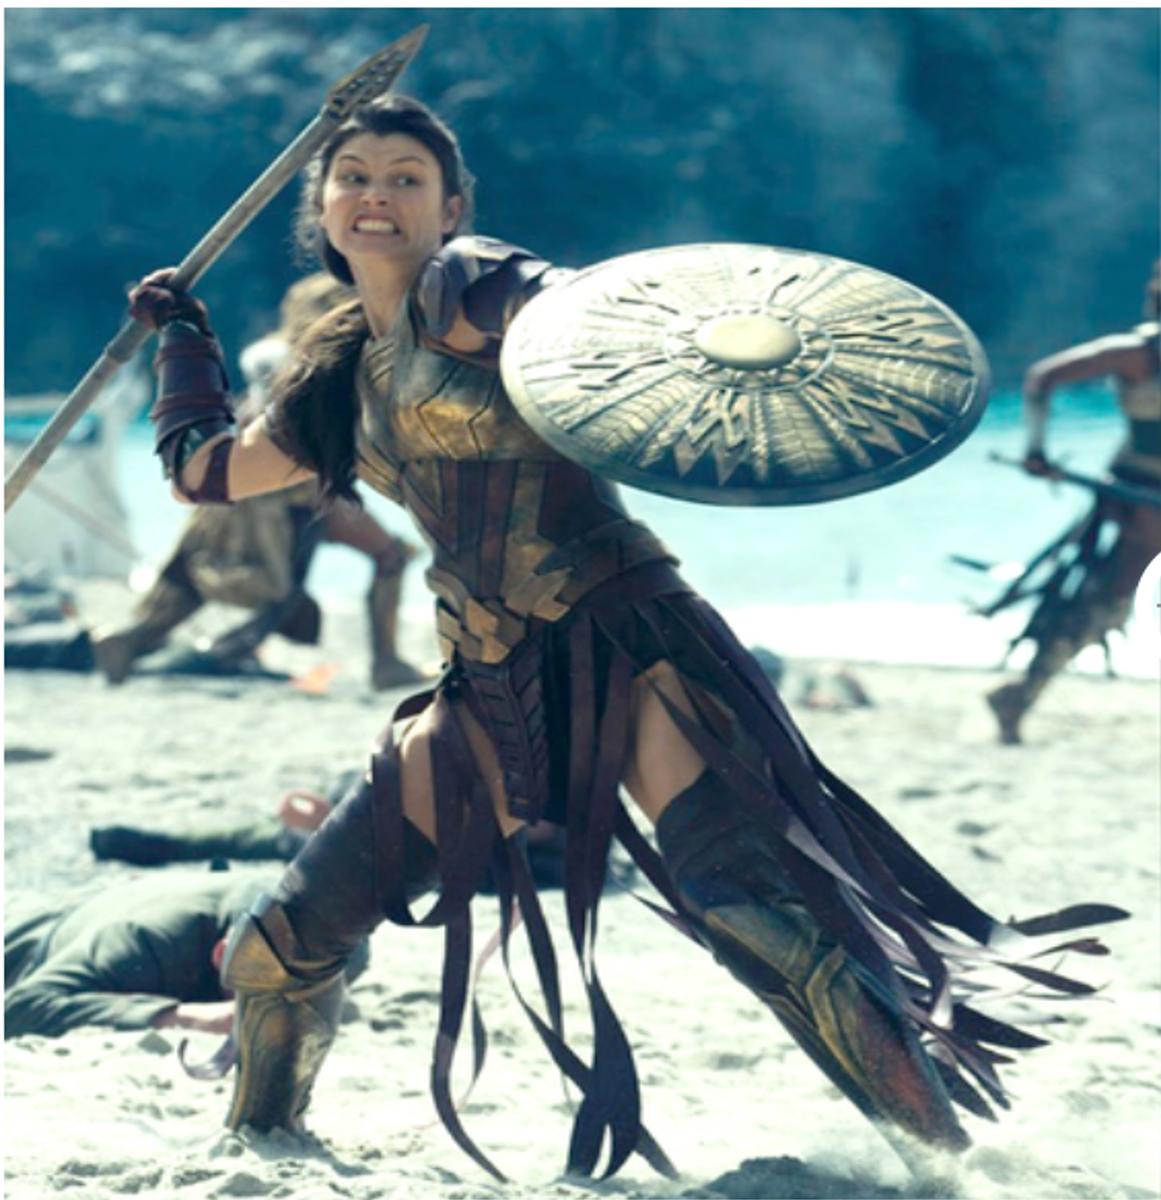 Menalippe Wonder Woman Warrior Woman Badass Women